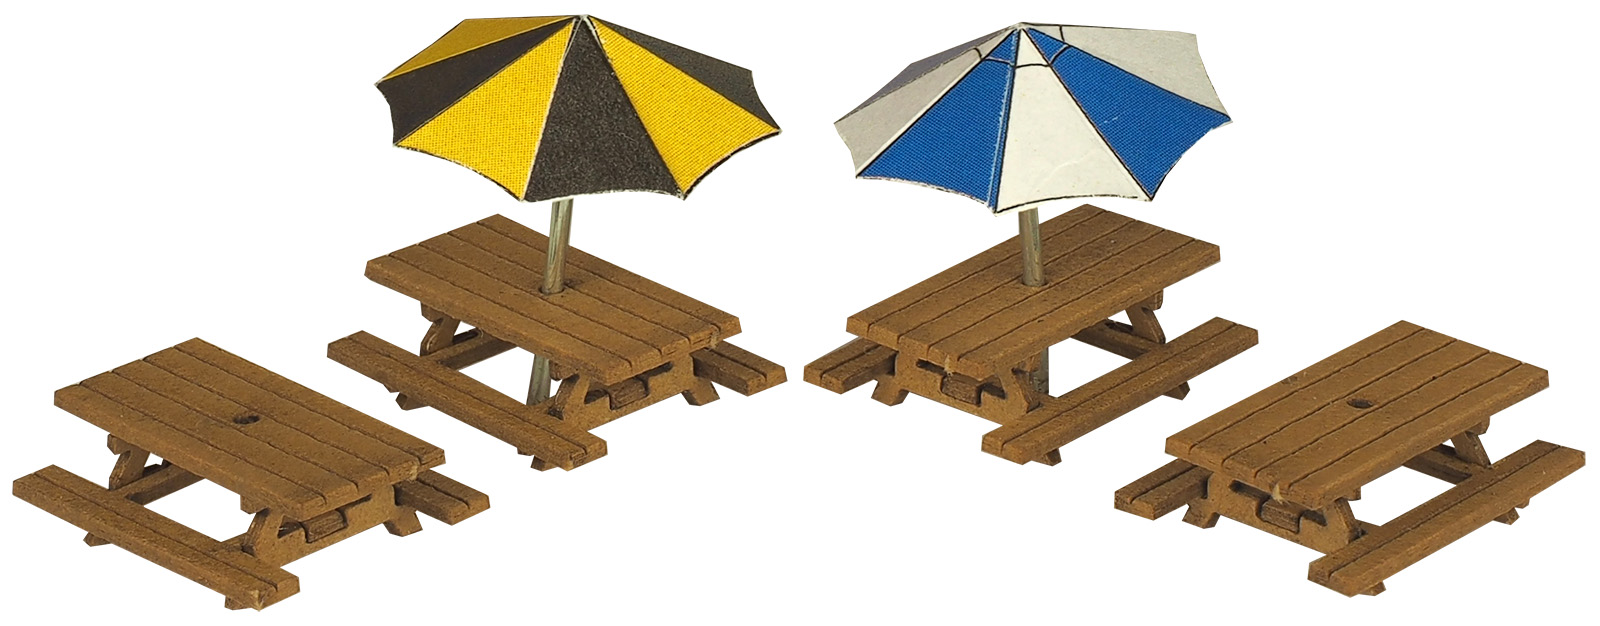 N Scale. Wooden Pavilion Metcalfe Mini Kit PN821